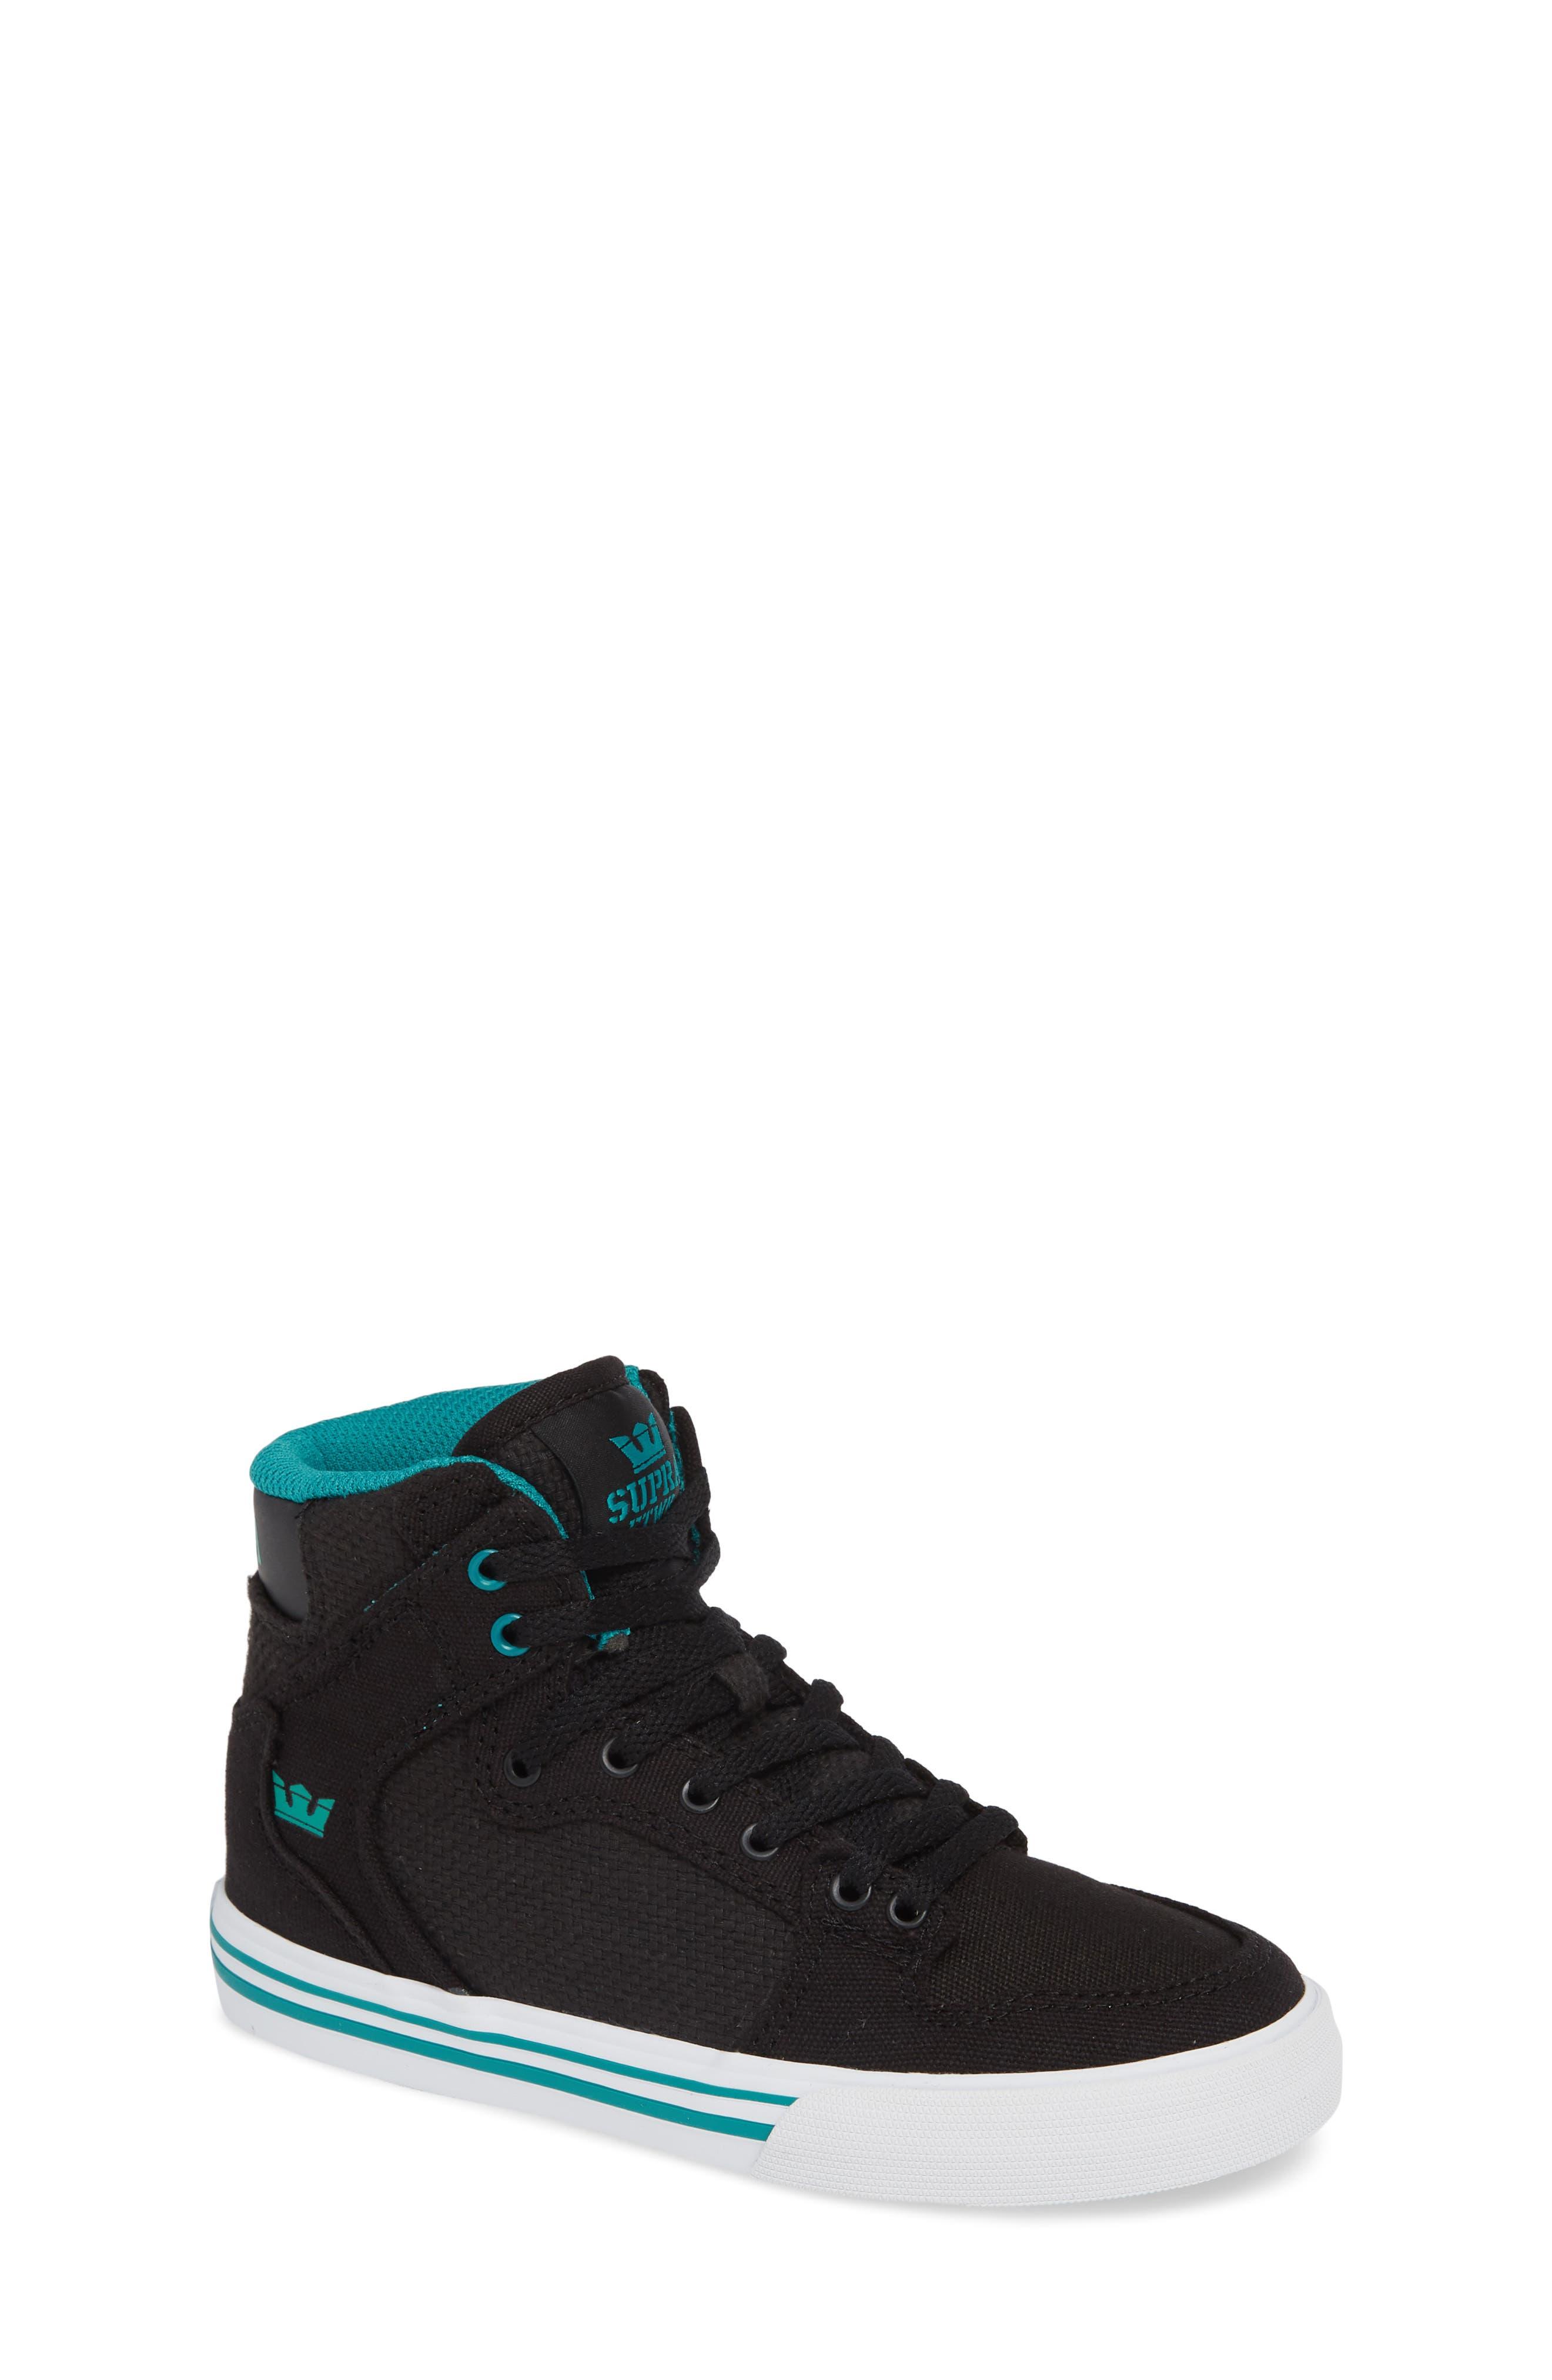 'Vaider' High Top Sneaker,                         Main,                         color, BLACK/ TEAL